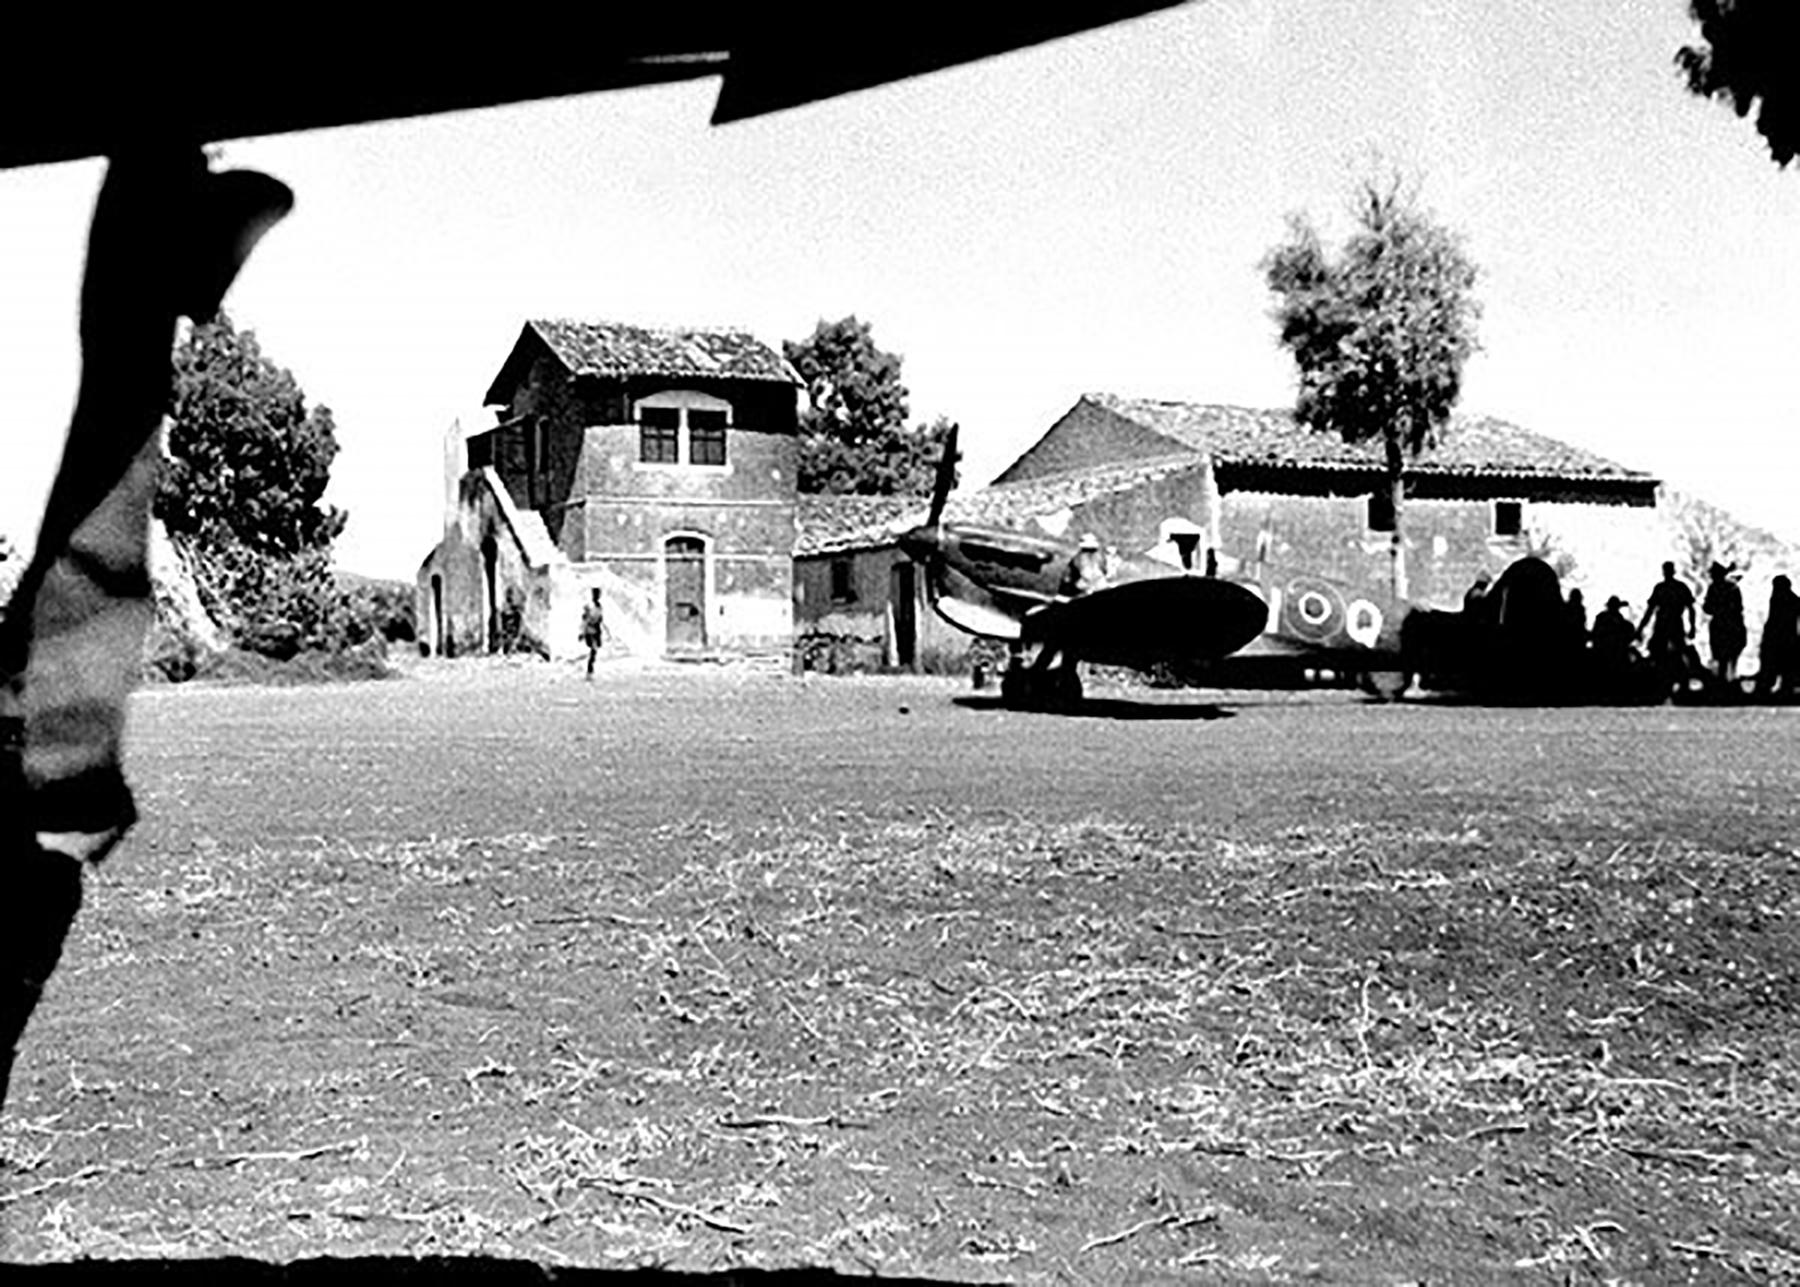 Spitfire MkVcTrop RCAF 417Sqn ANQ an Italian farmhouse used as HQ near Lentini Sicily Aug 26 1943 01